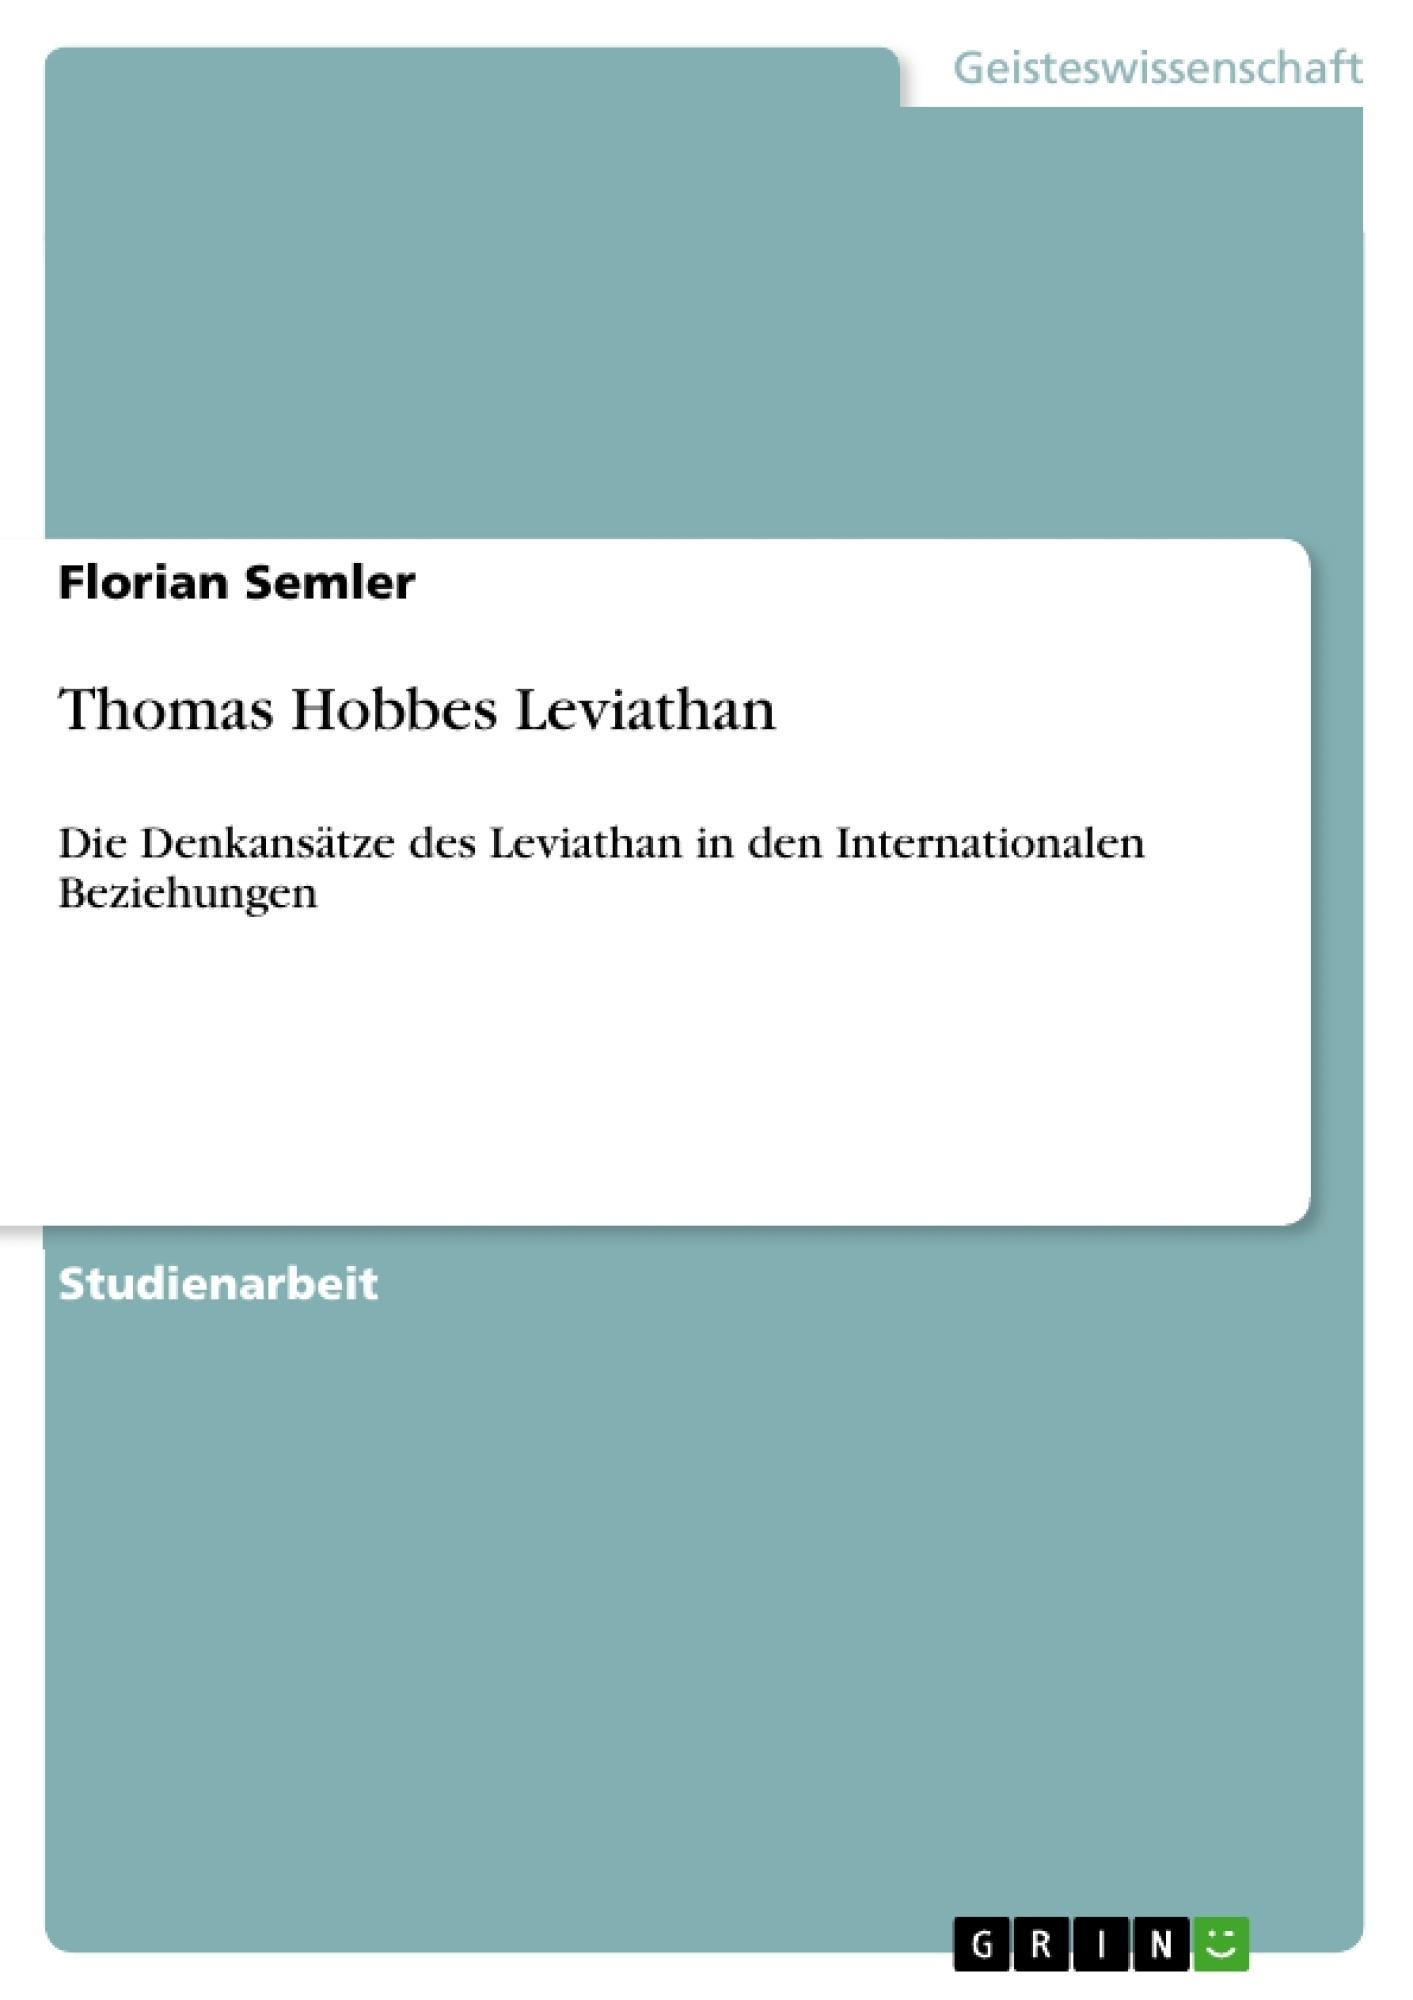 Titel: Thomas Hobbes Leviathan